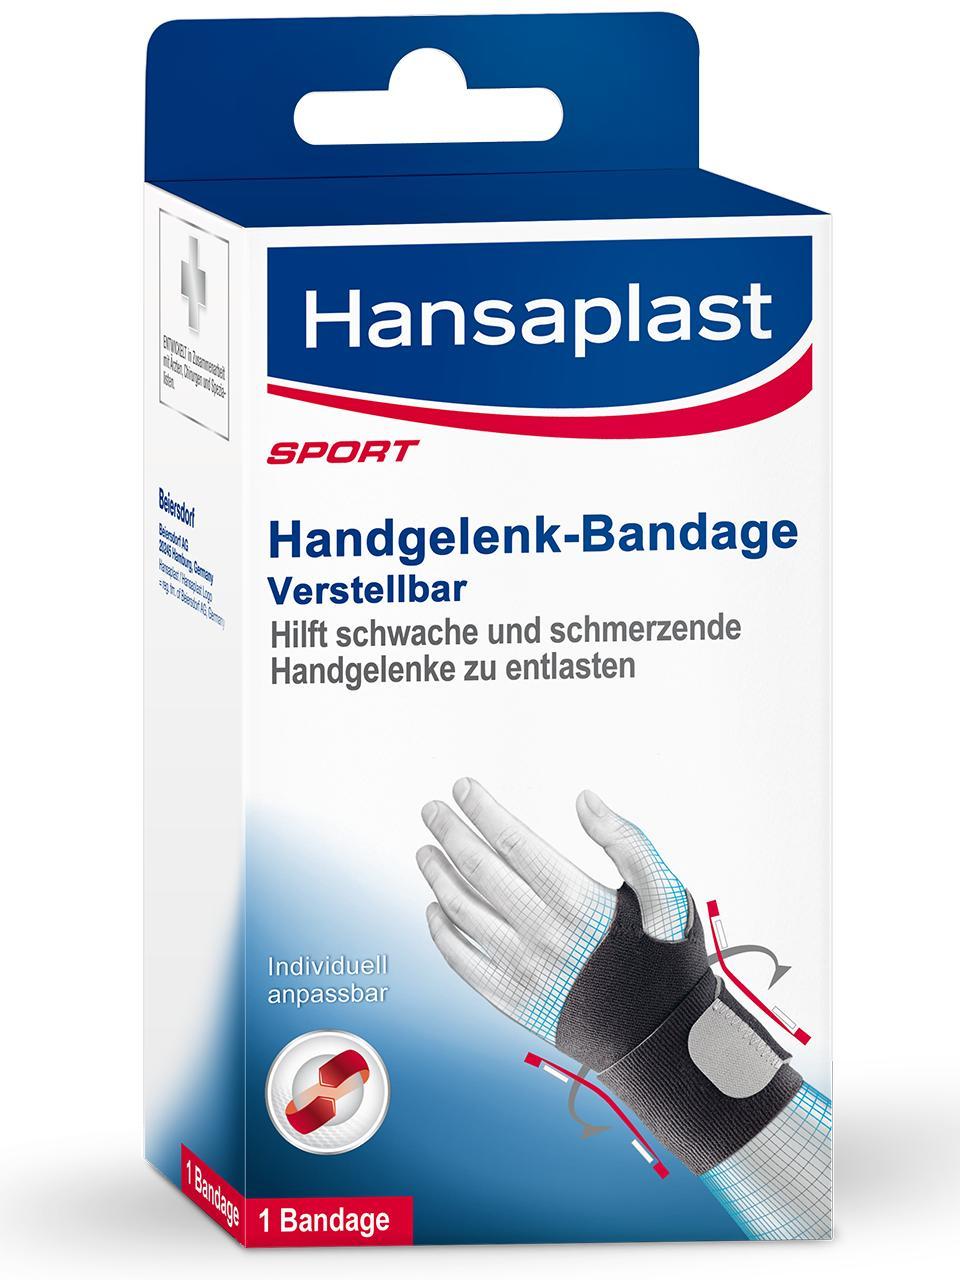 Handgelenks-Bandage Hansaplast